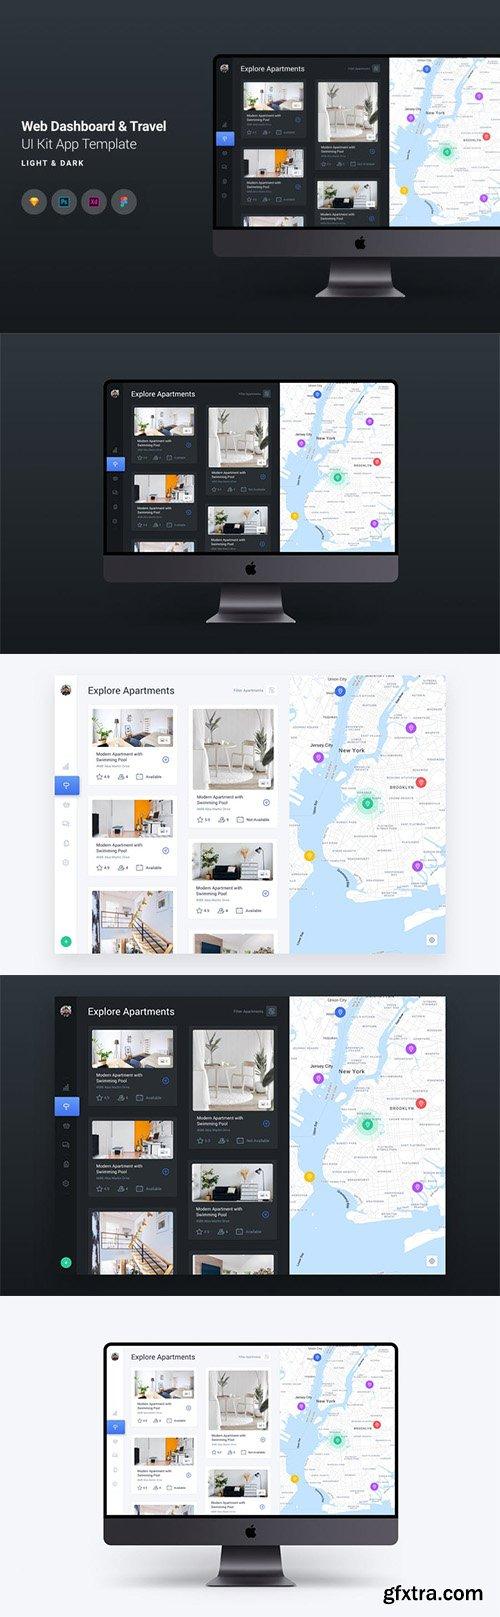 Web Dashboard & Travel UI Kit App Template 5